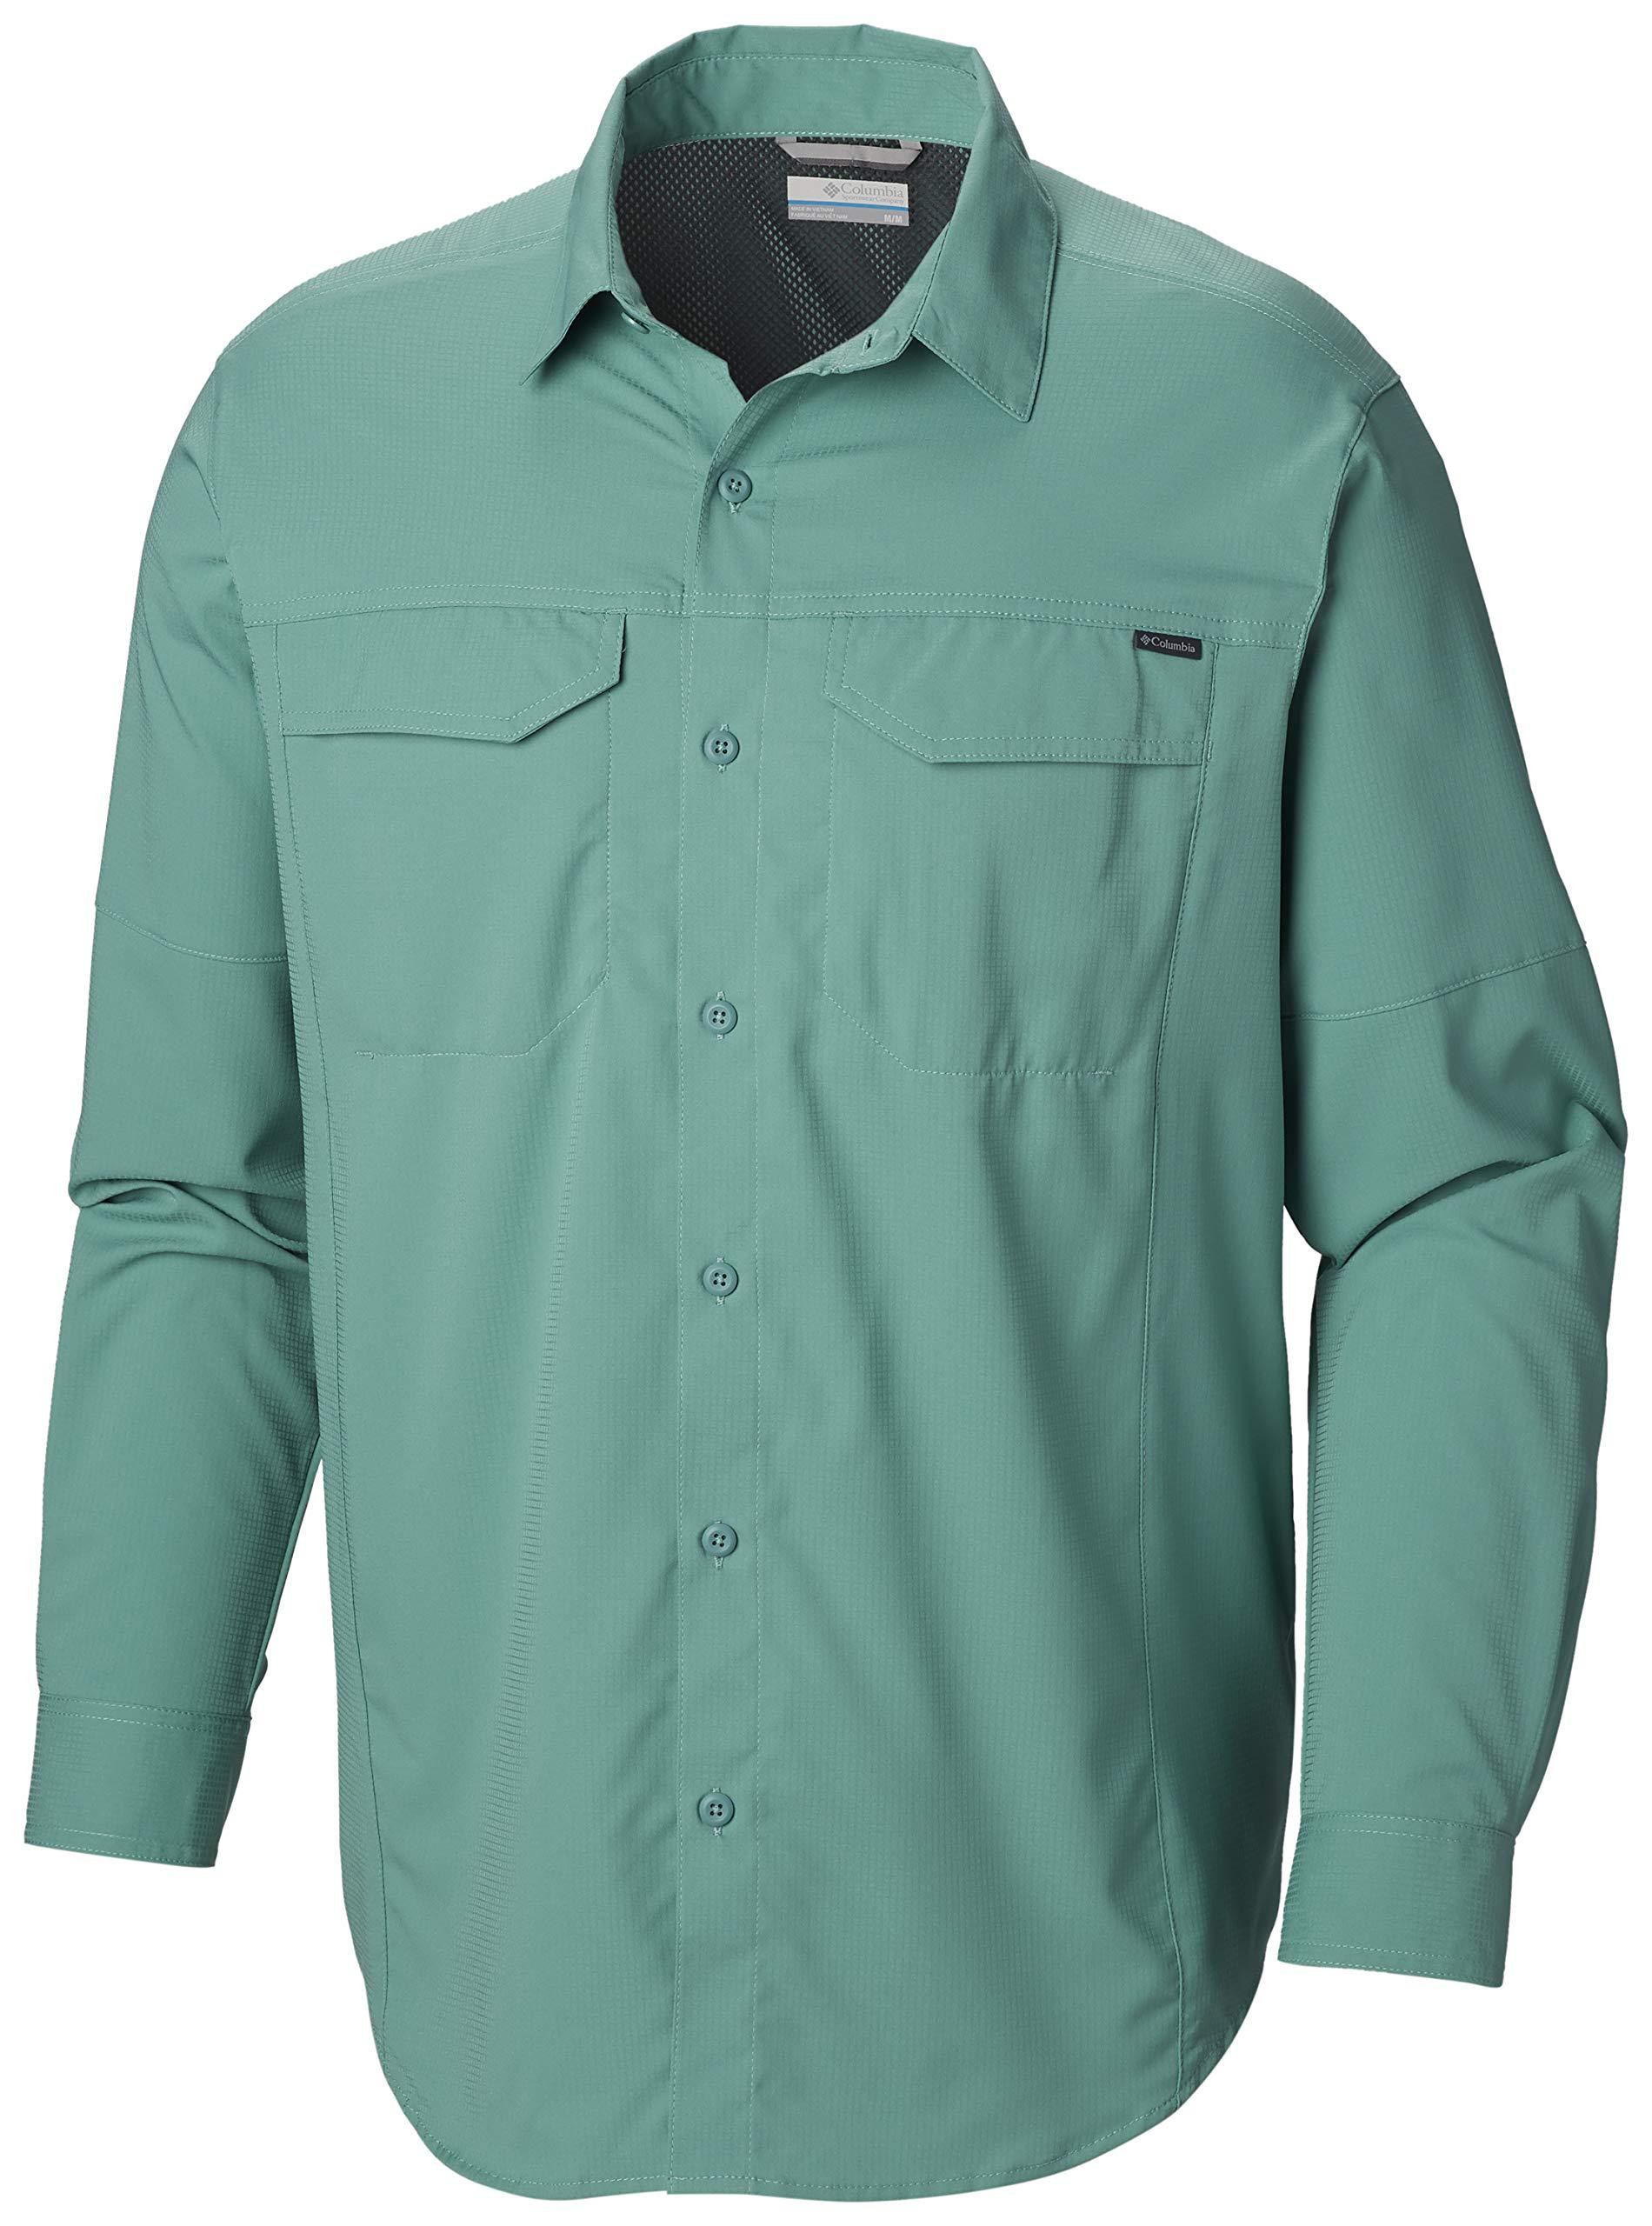 Columbia Men's Silver Ridge Lite Long Sleeve Shirt, Copper Ore, Small